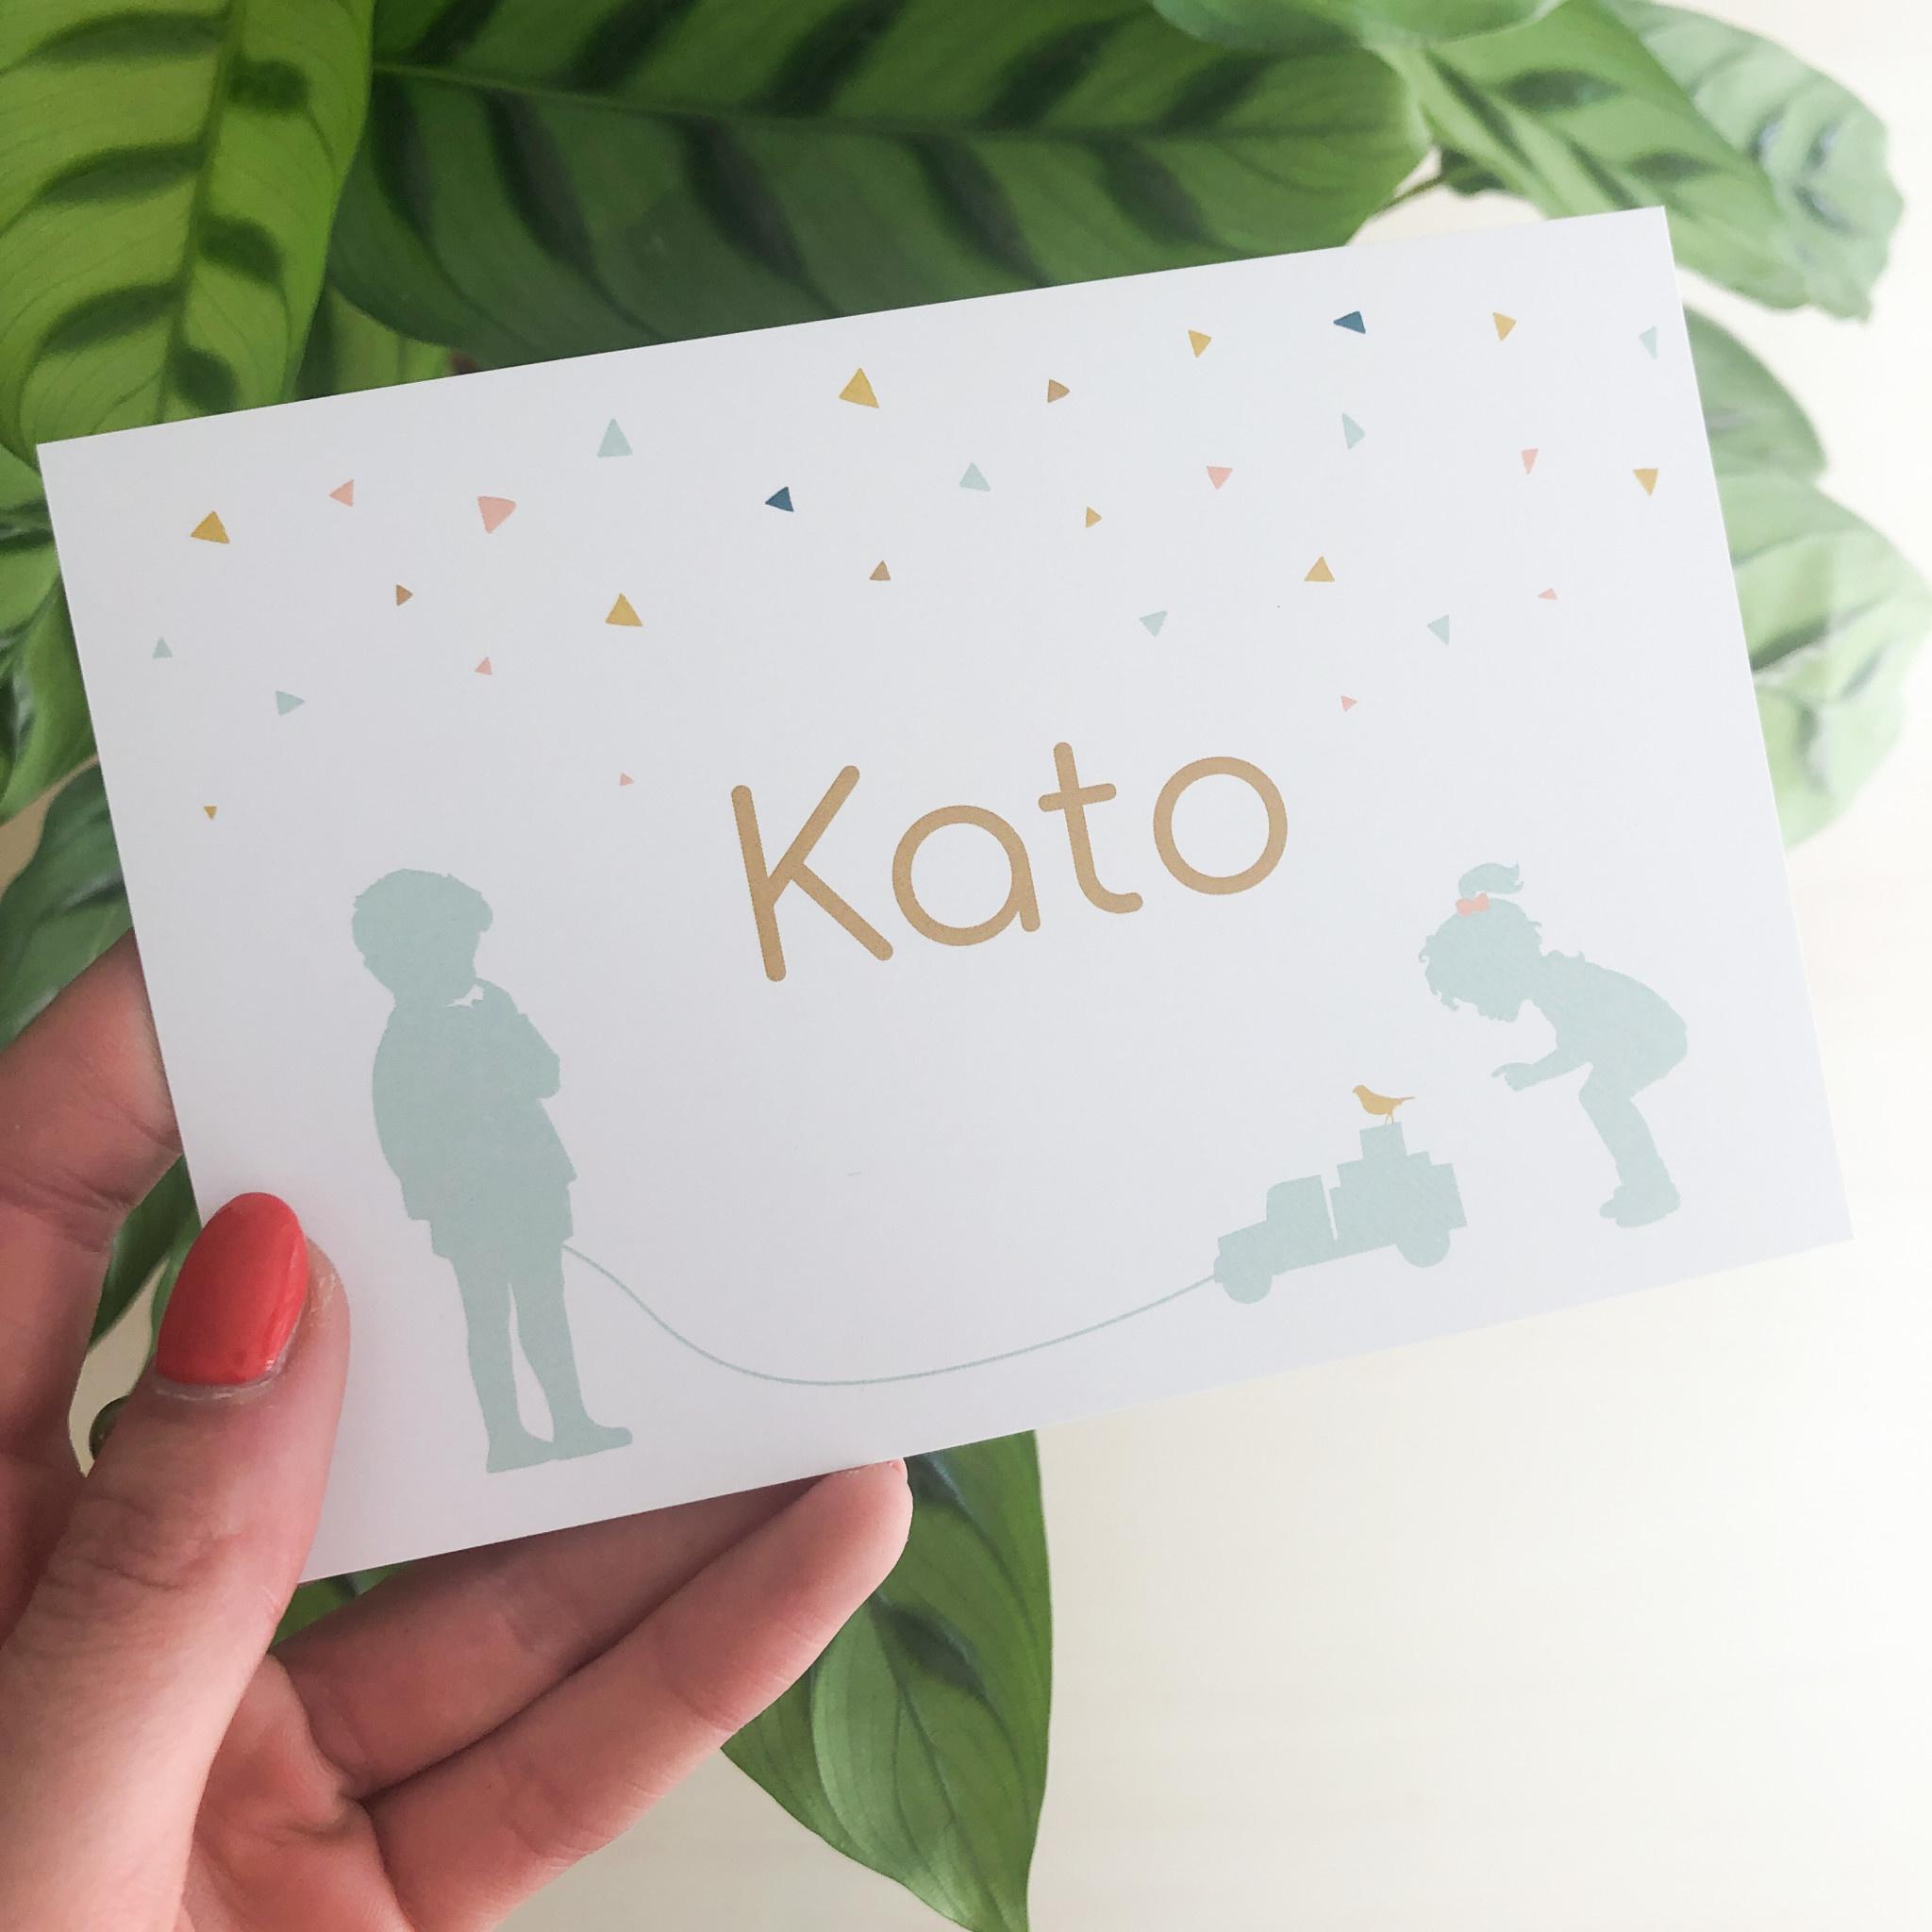 geboren - 04-30 Kato